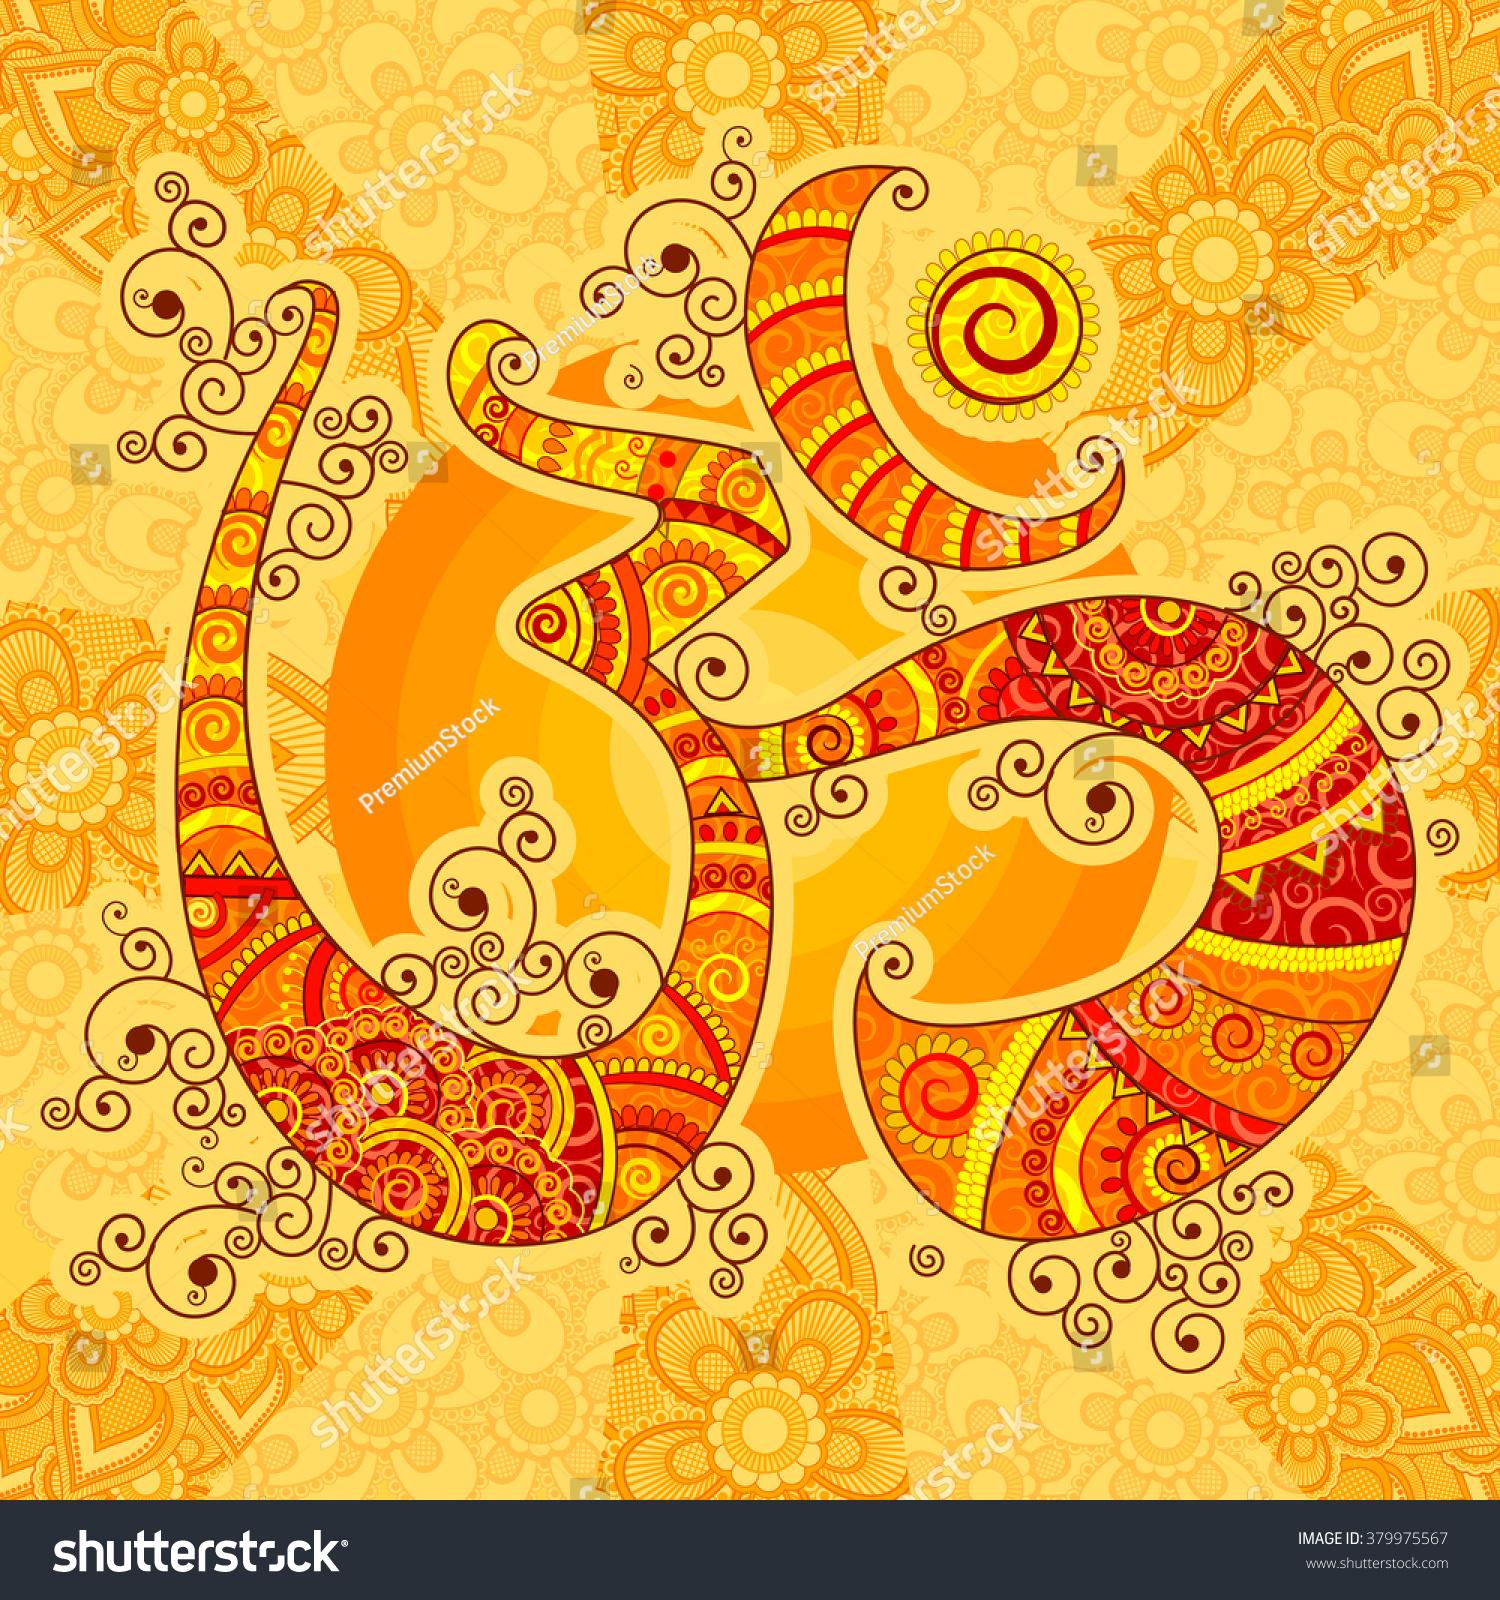 Vector design om symbol indian art stock vector 379975567 vector design of om symbol in indian art style buycottarizona